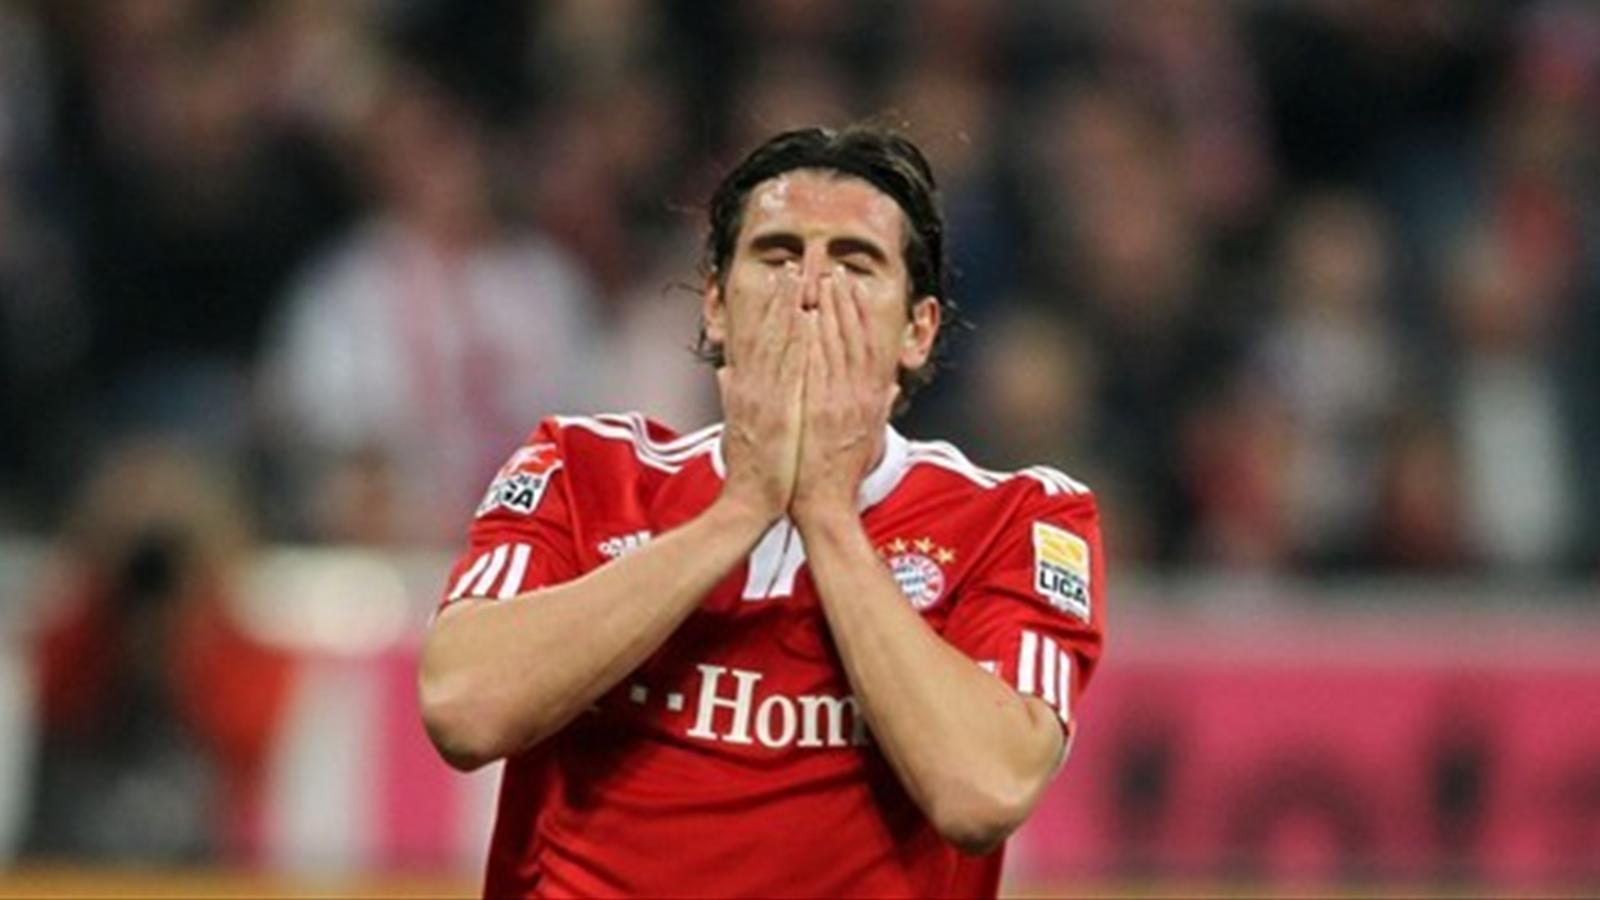 Le bayern coule bundesliga 2010 2011 football eurosport for Bundesliga 2010